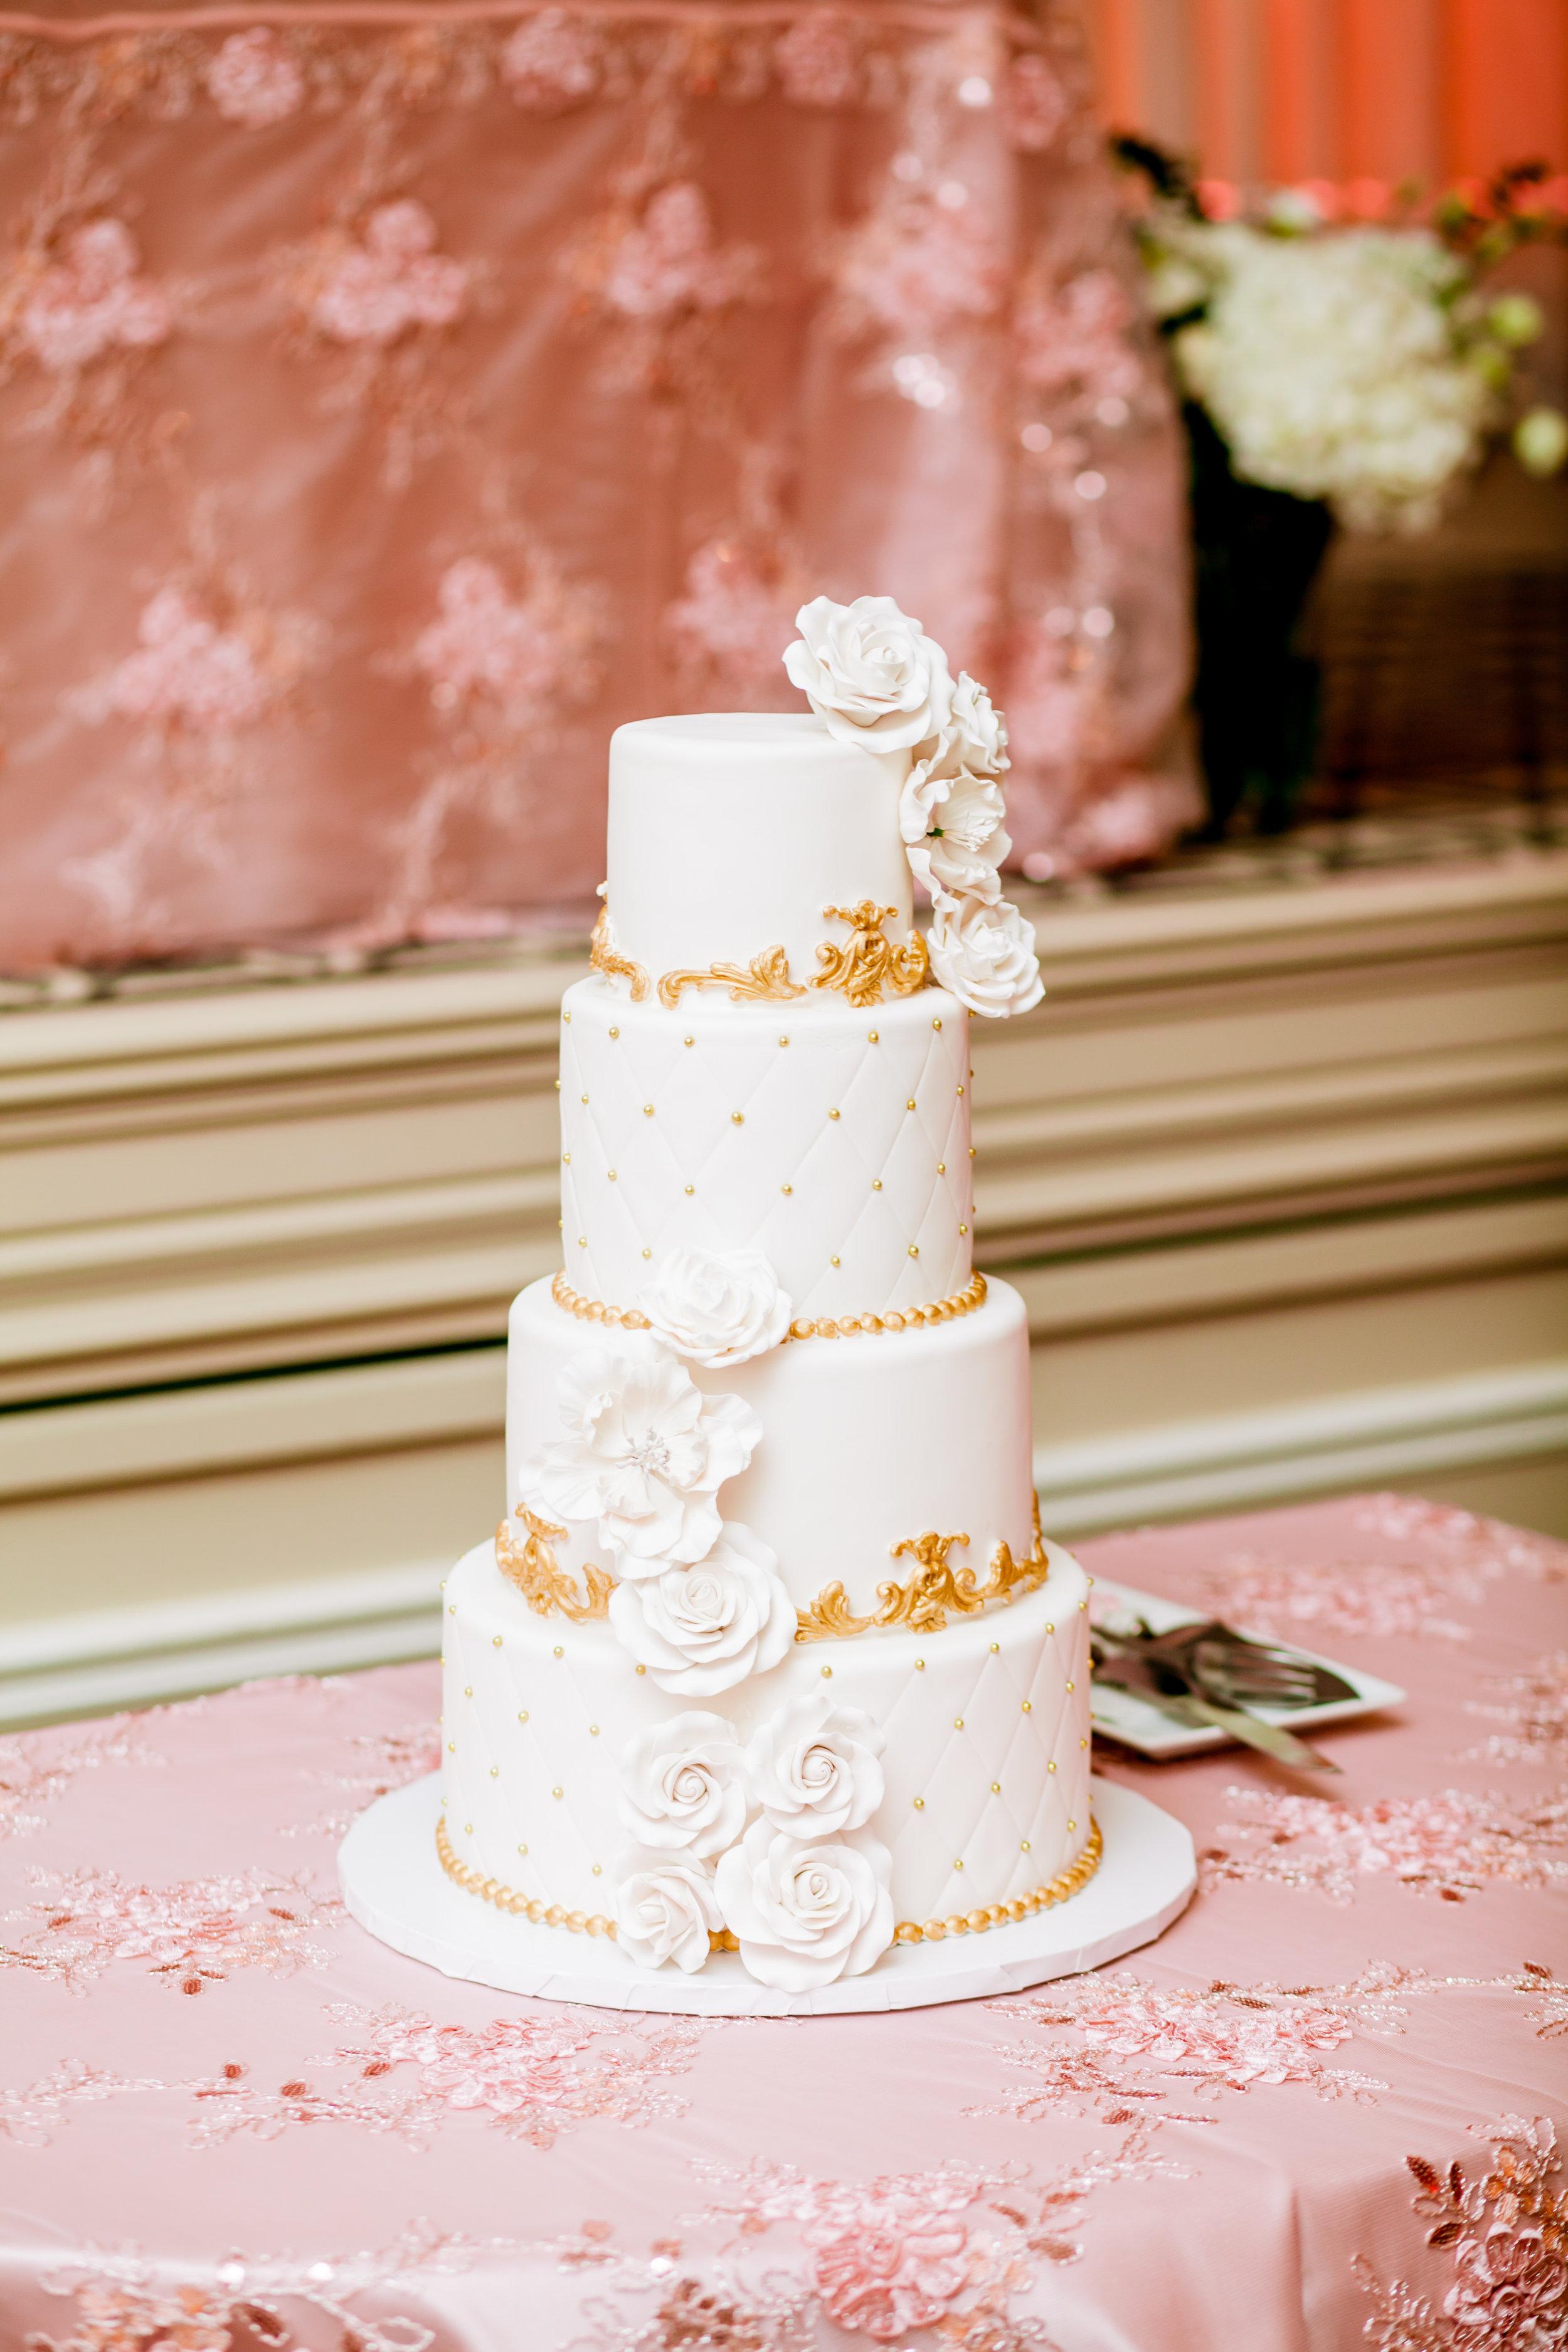 Lavinia_Carl_Wedding_Paradise_Banquet_Hall_Karimah_Gheddai_Photography_3